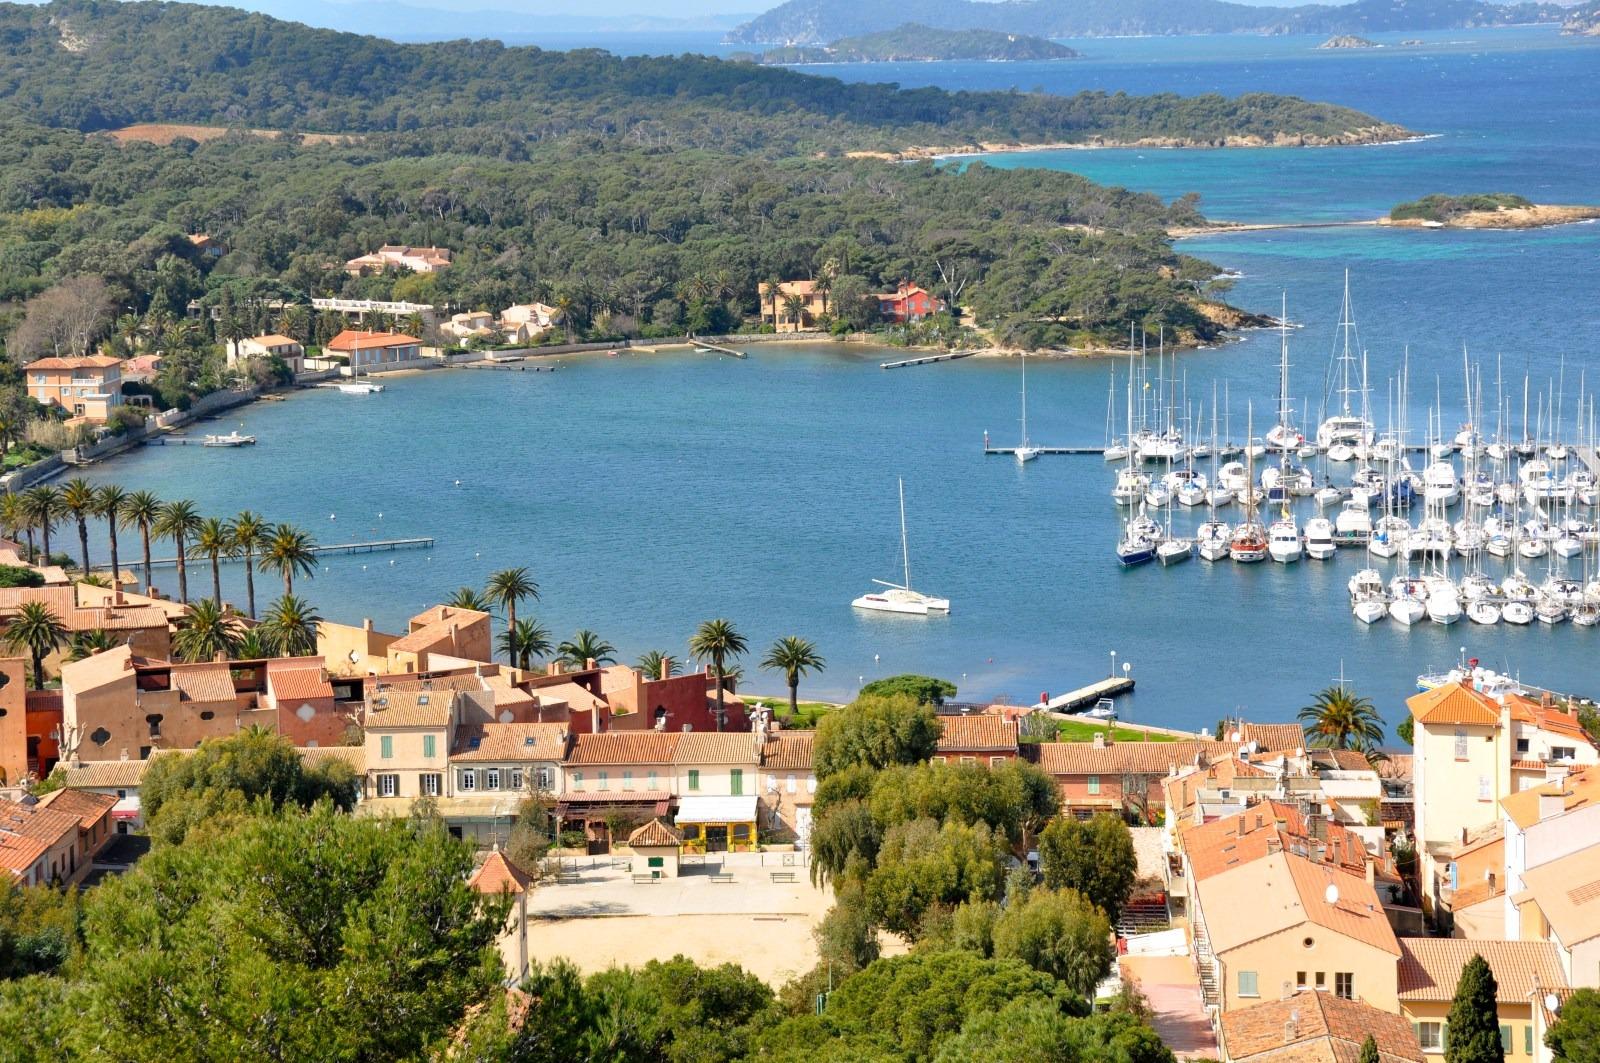 Le village Porquerolles par le Clos des Galéjades - Location de vacances à Porquerolles